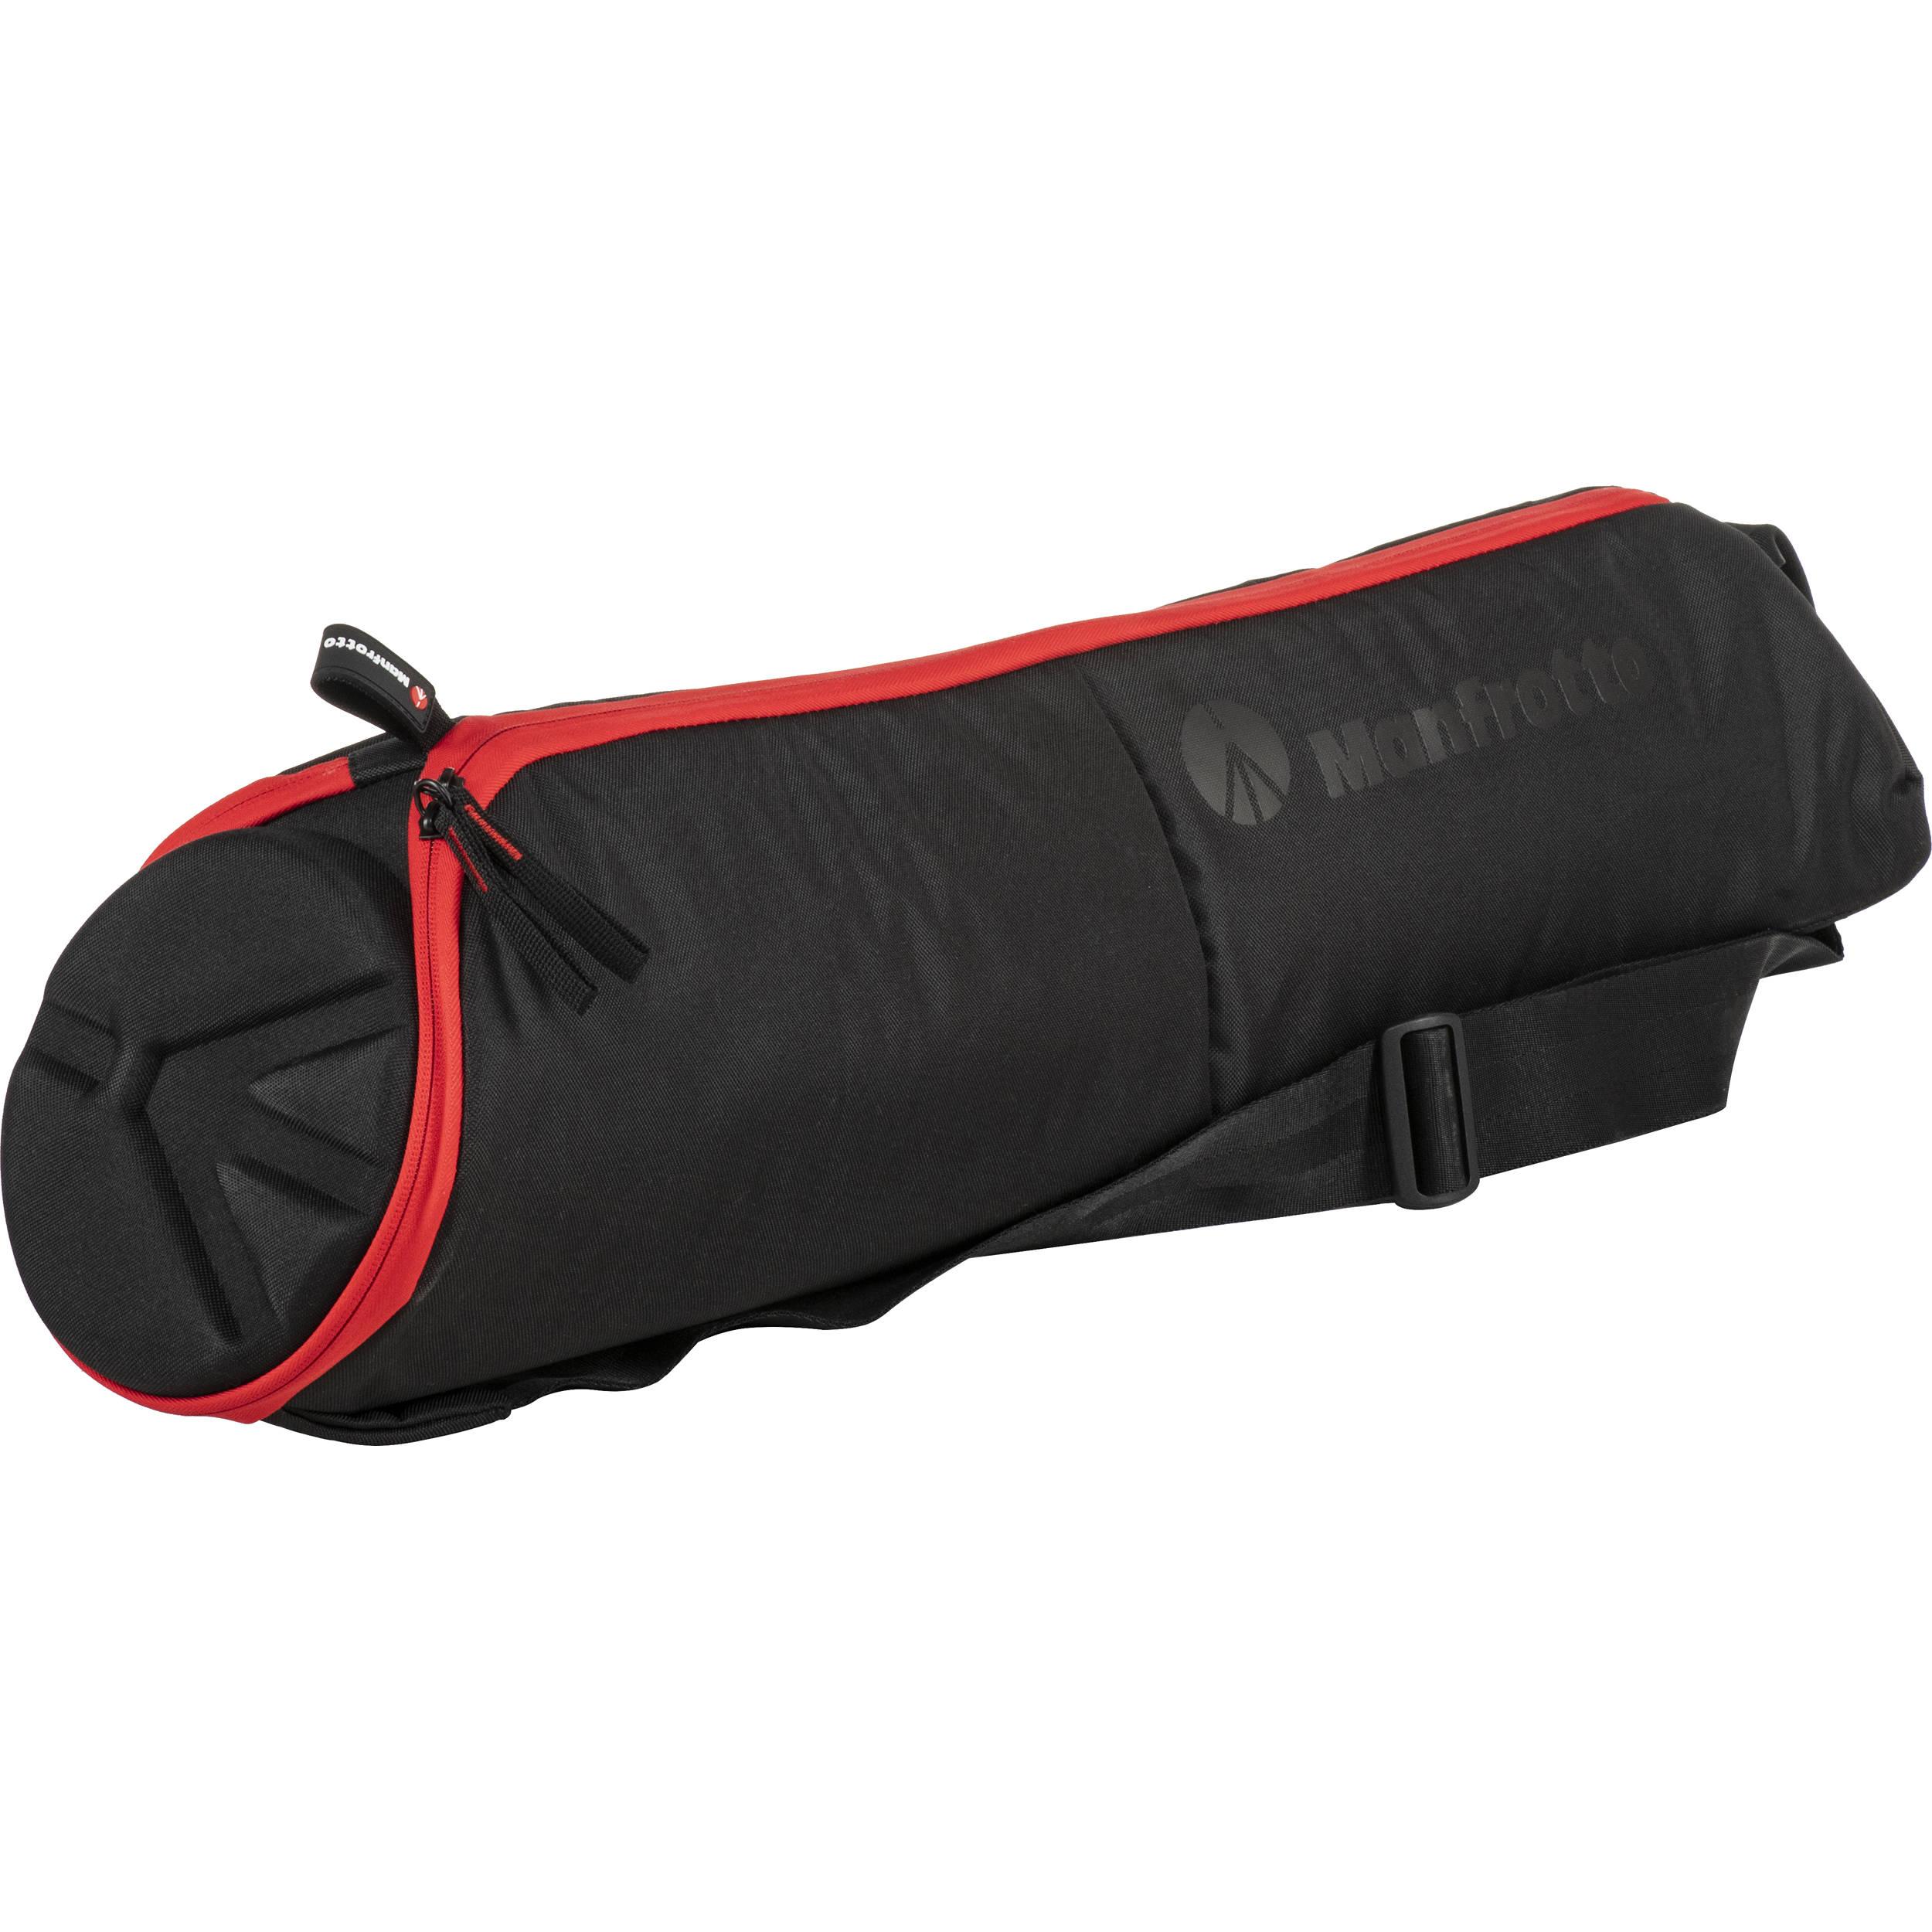 Black Manfrotto MB MBAG75PN Tripod Bag Padded 75cm